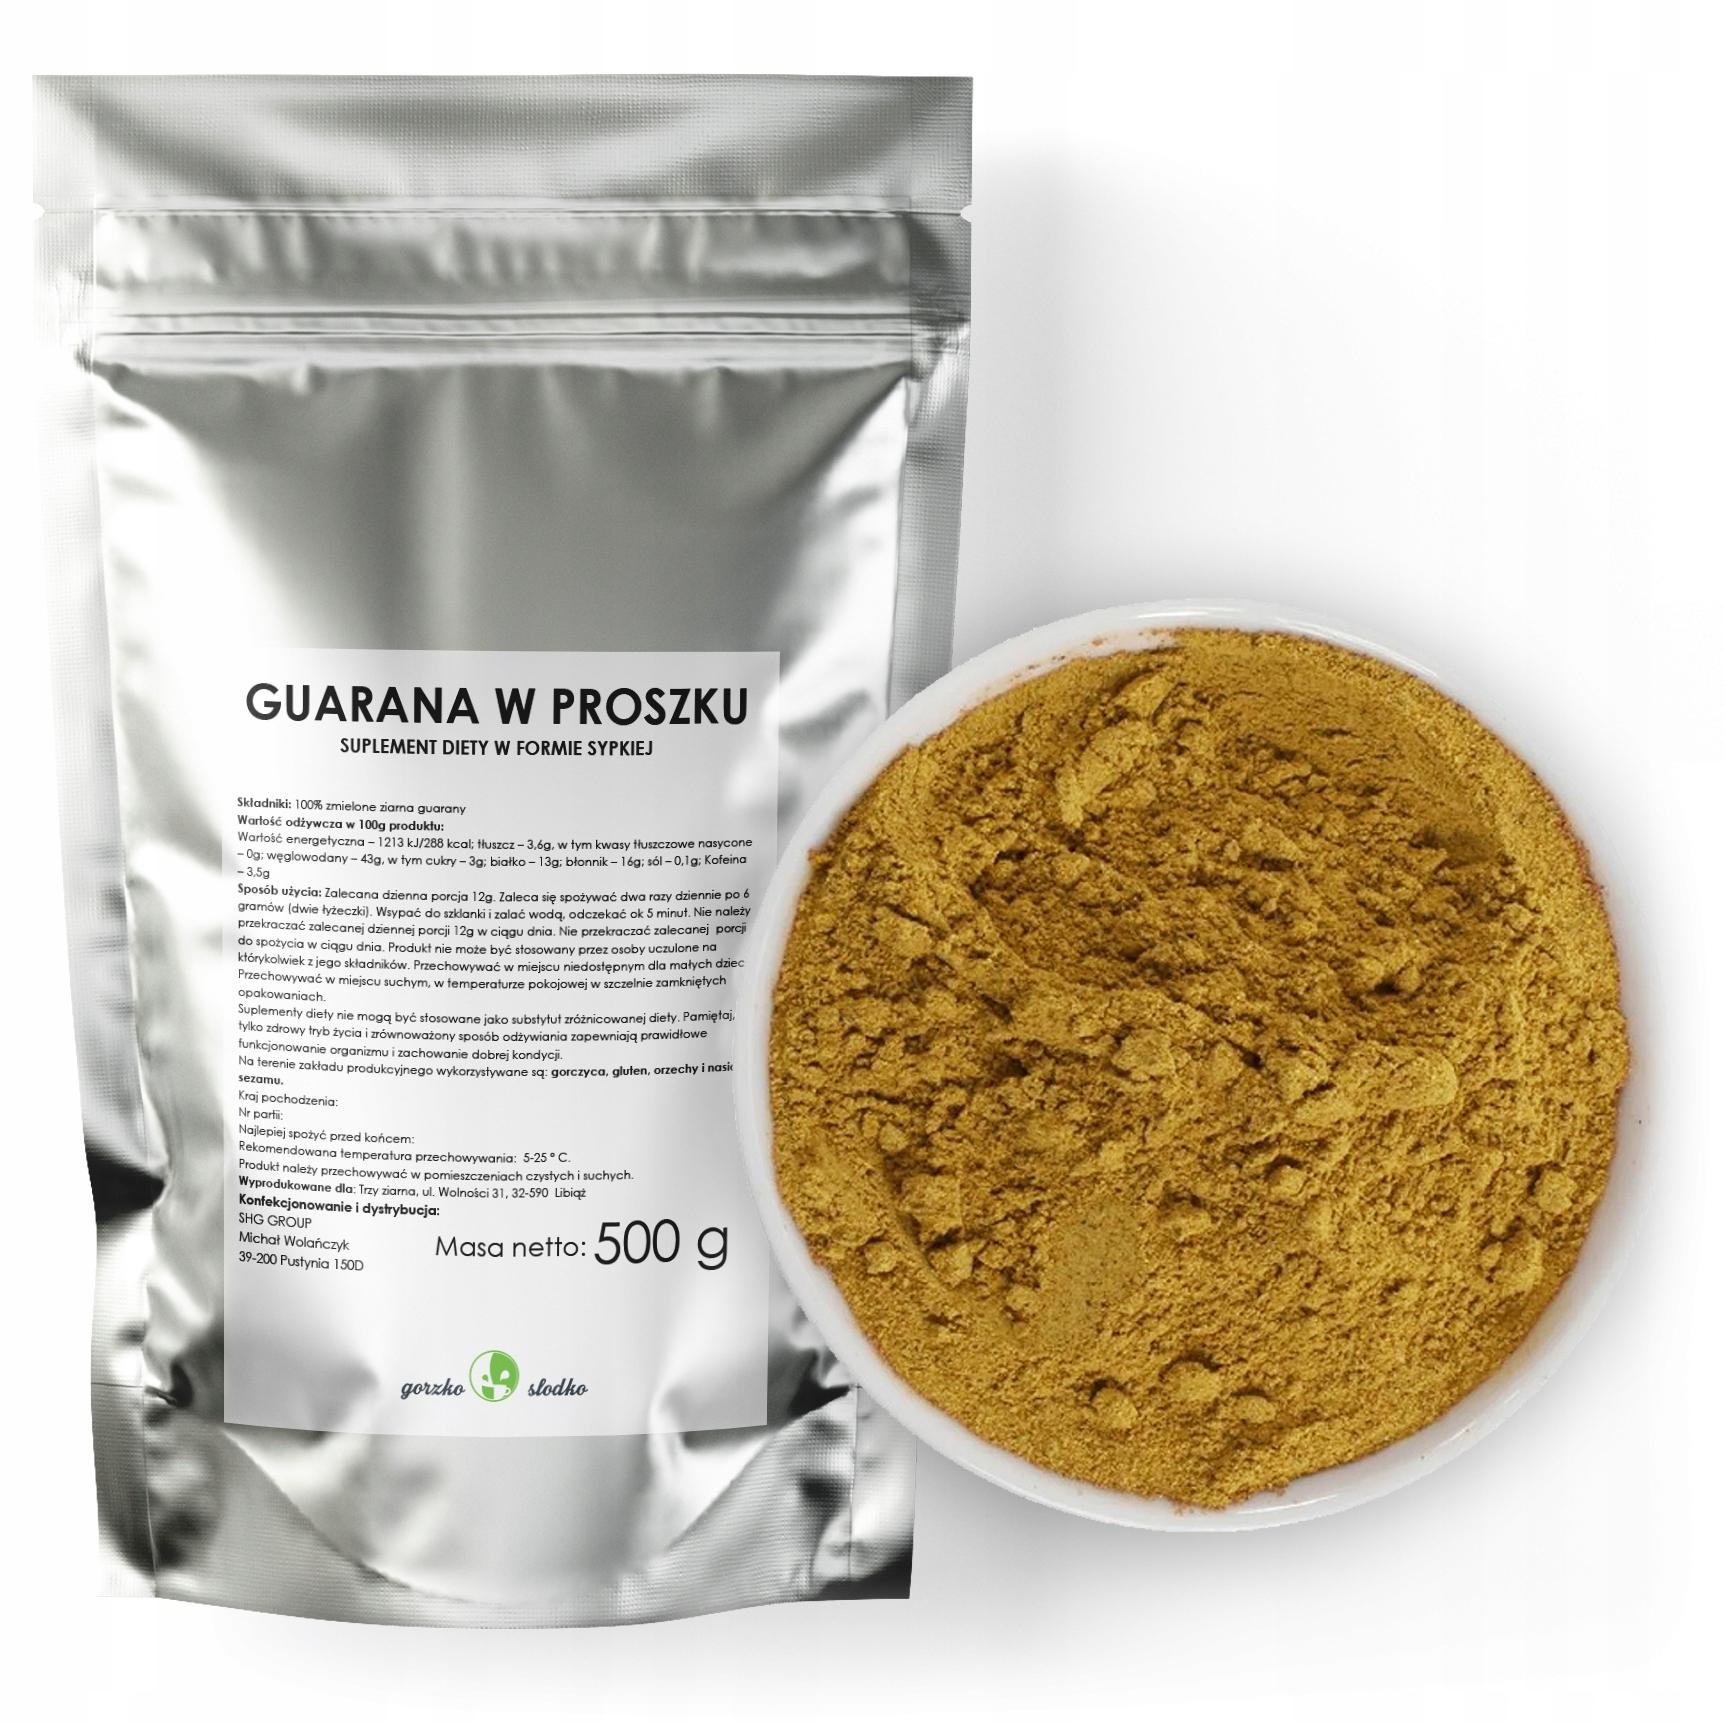 GUARANA молотый натуральный энергетический кофеин 500 г